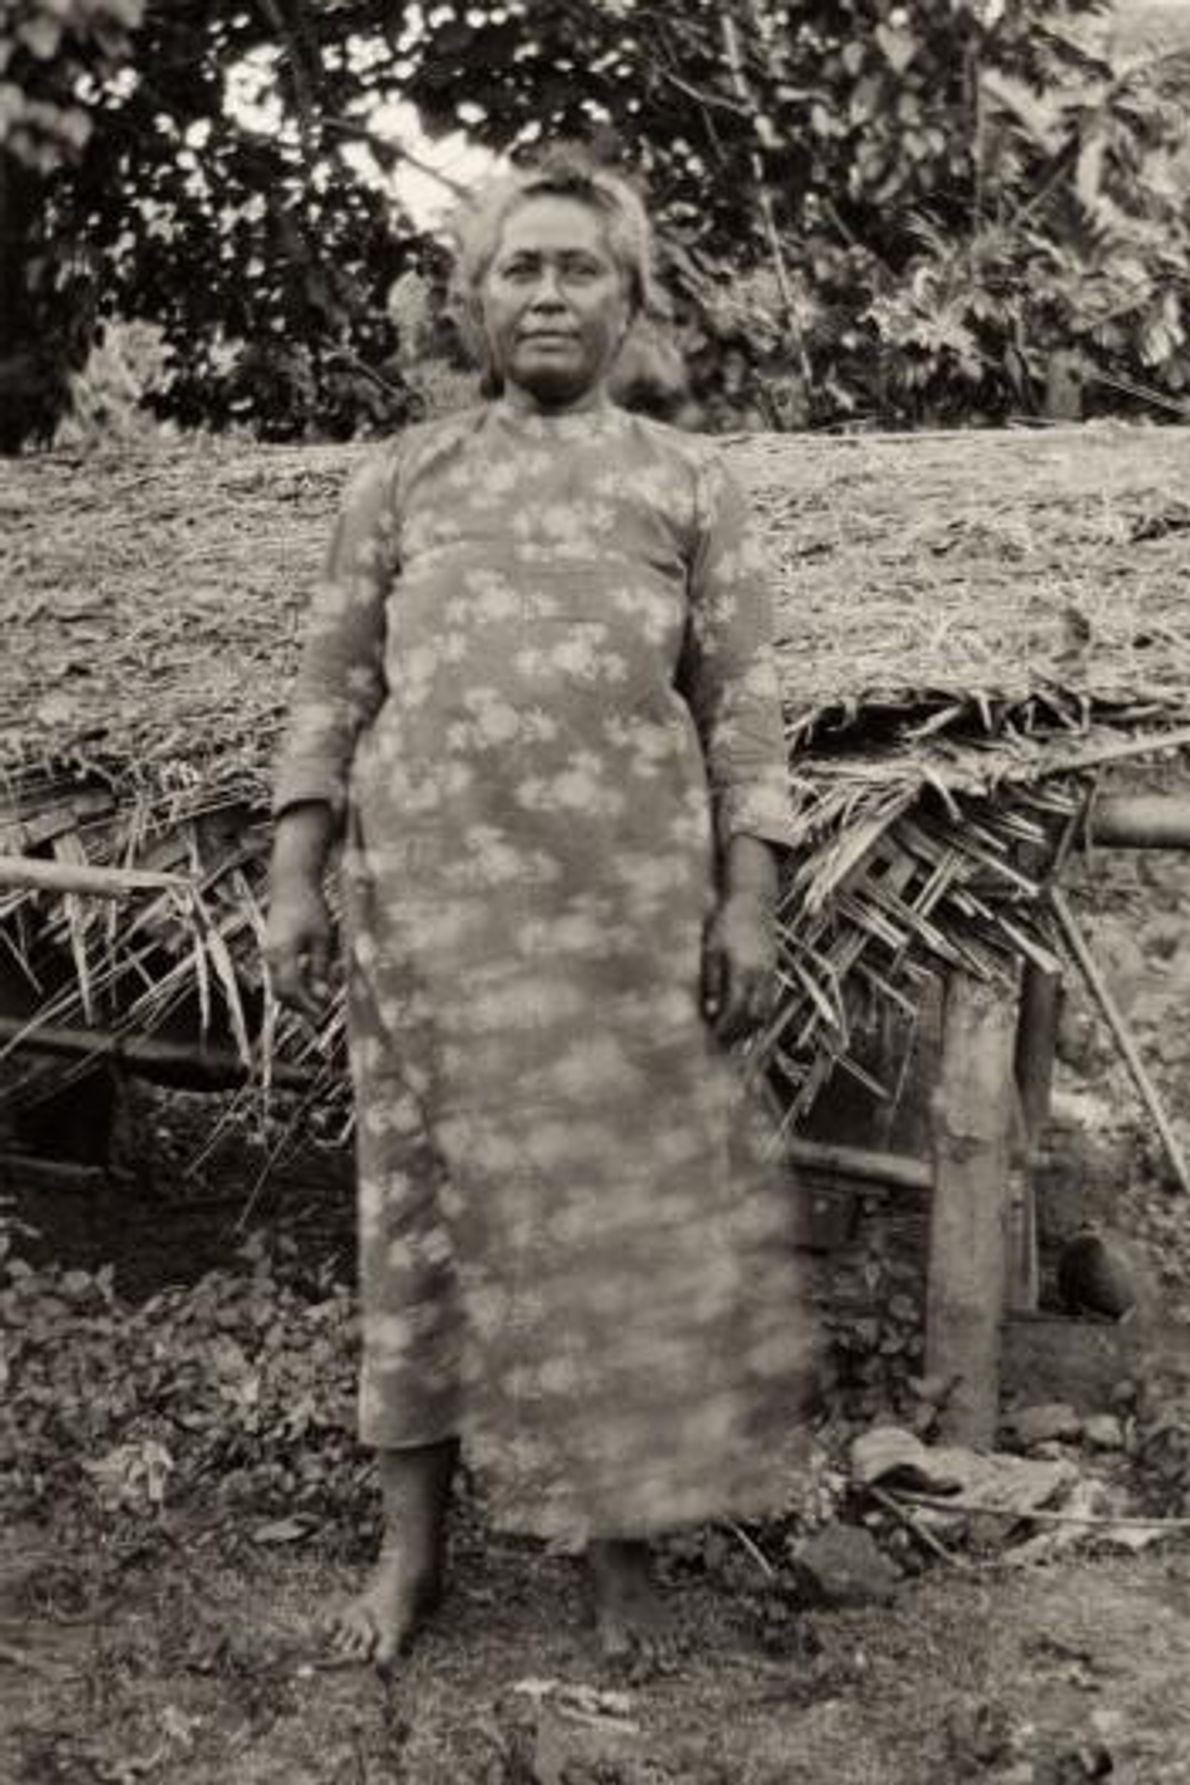 Reina de Nuku Hiva